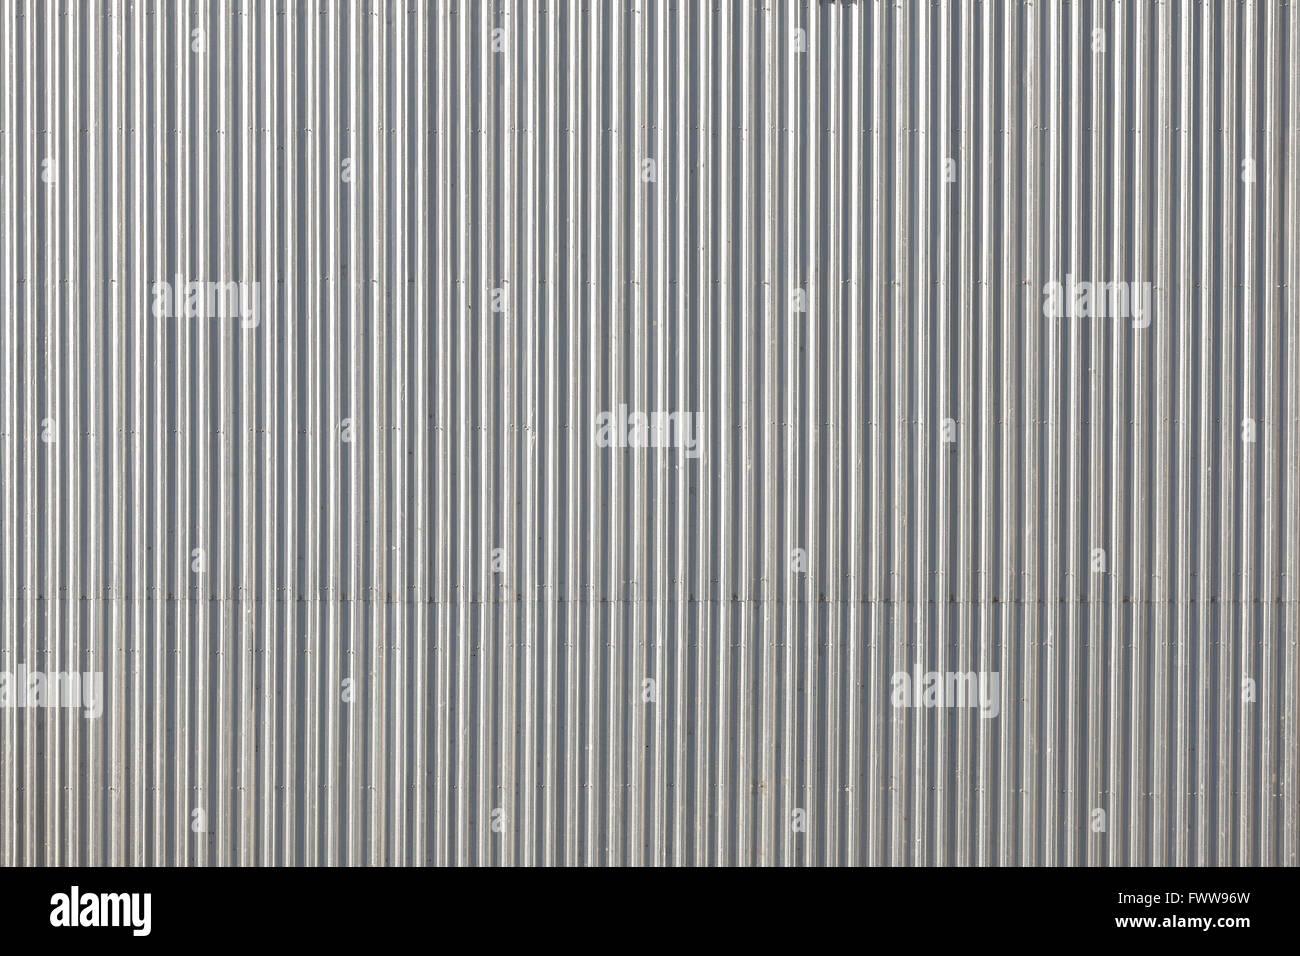 Corrugated Sheet Roof Stock Photos Amp Corrugated Sheet Roof